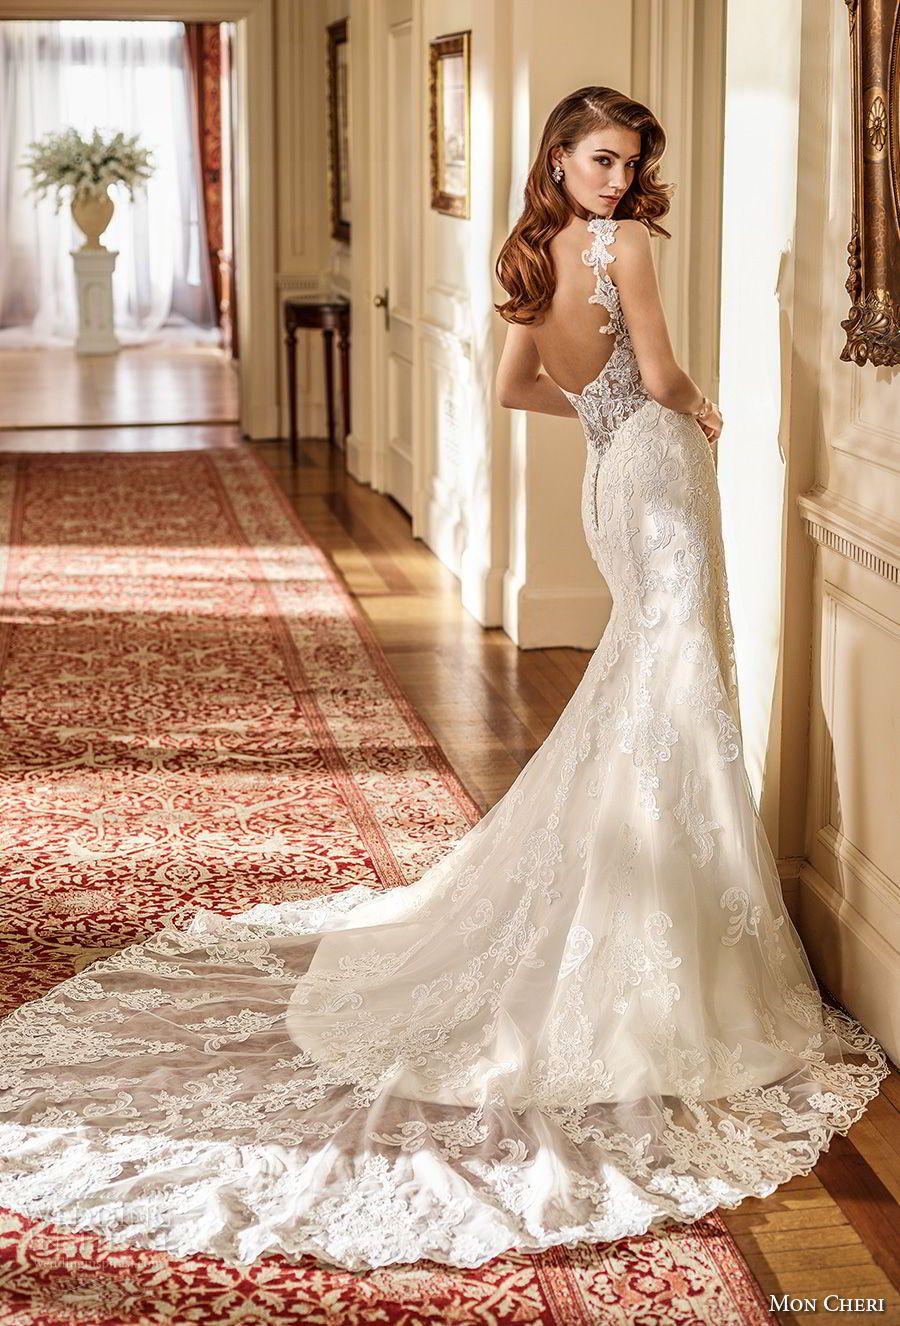 Mon cheri fall wedding dresses mermaid wedding dresses